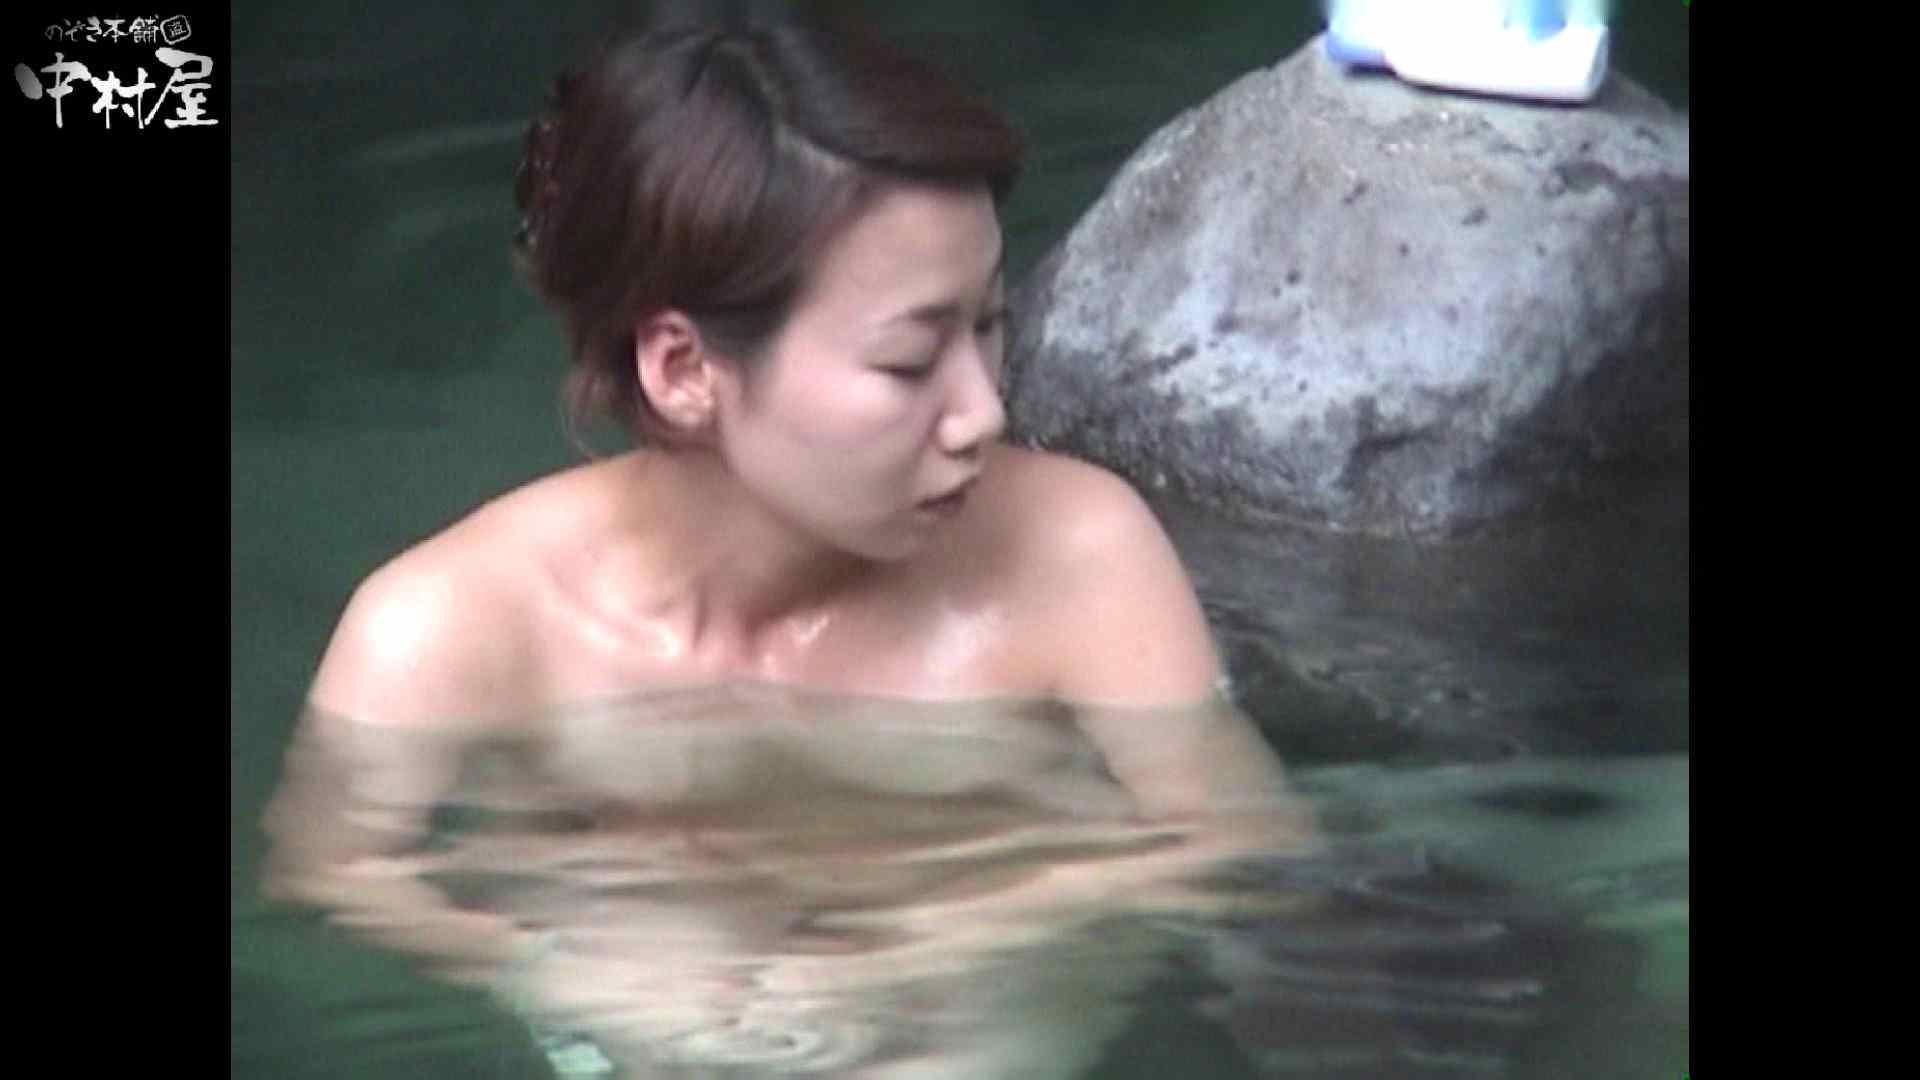 Aquaな露天風呂Vol.951 盗撮映像  93Pix 49